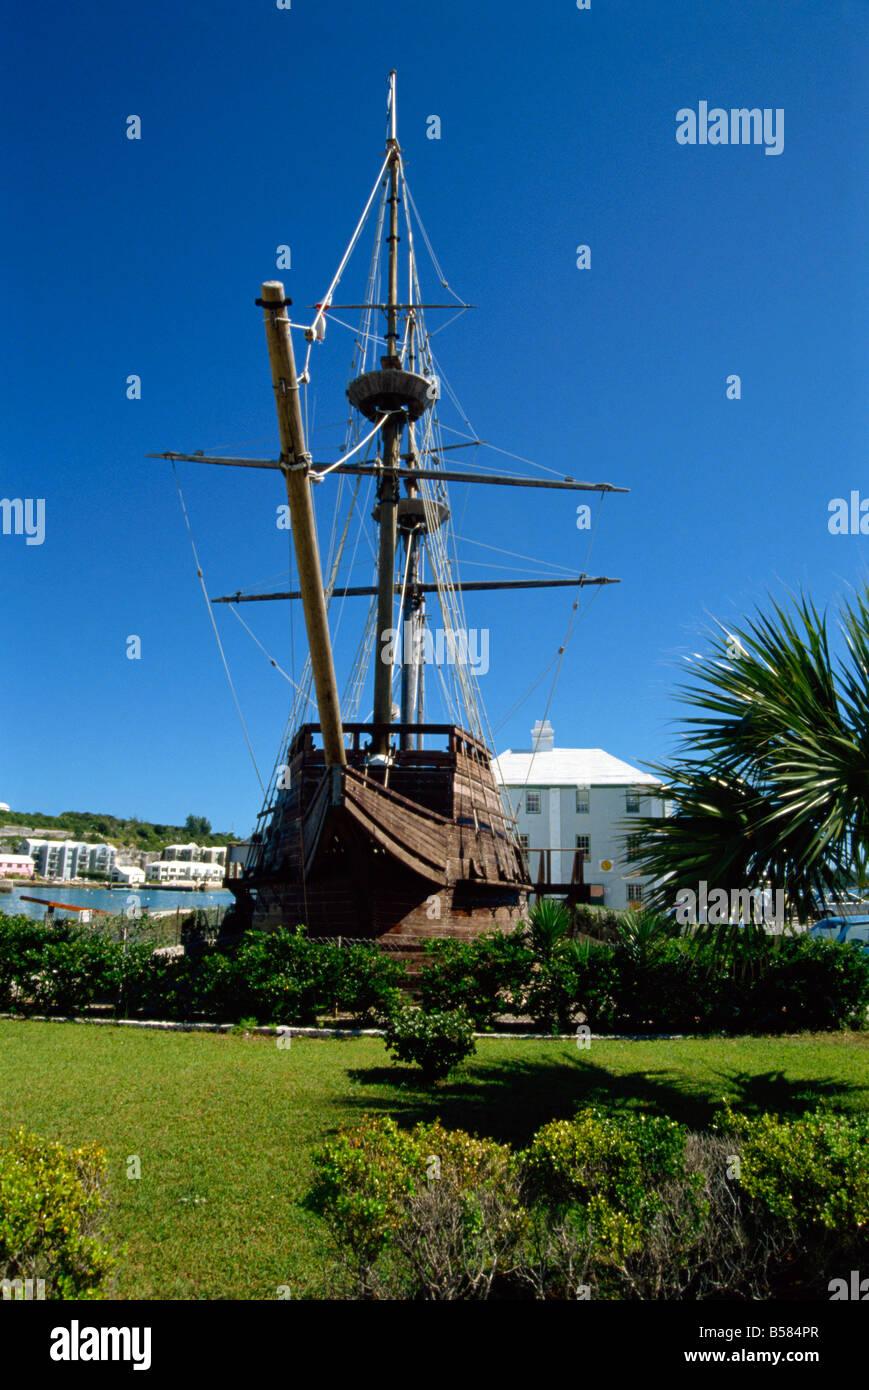 St George Bermuda Atlantic Ocean Central America - Stock Image